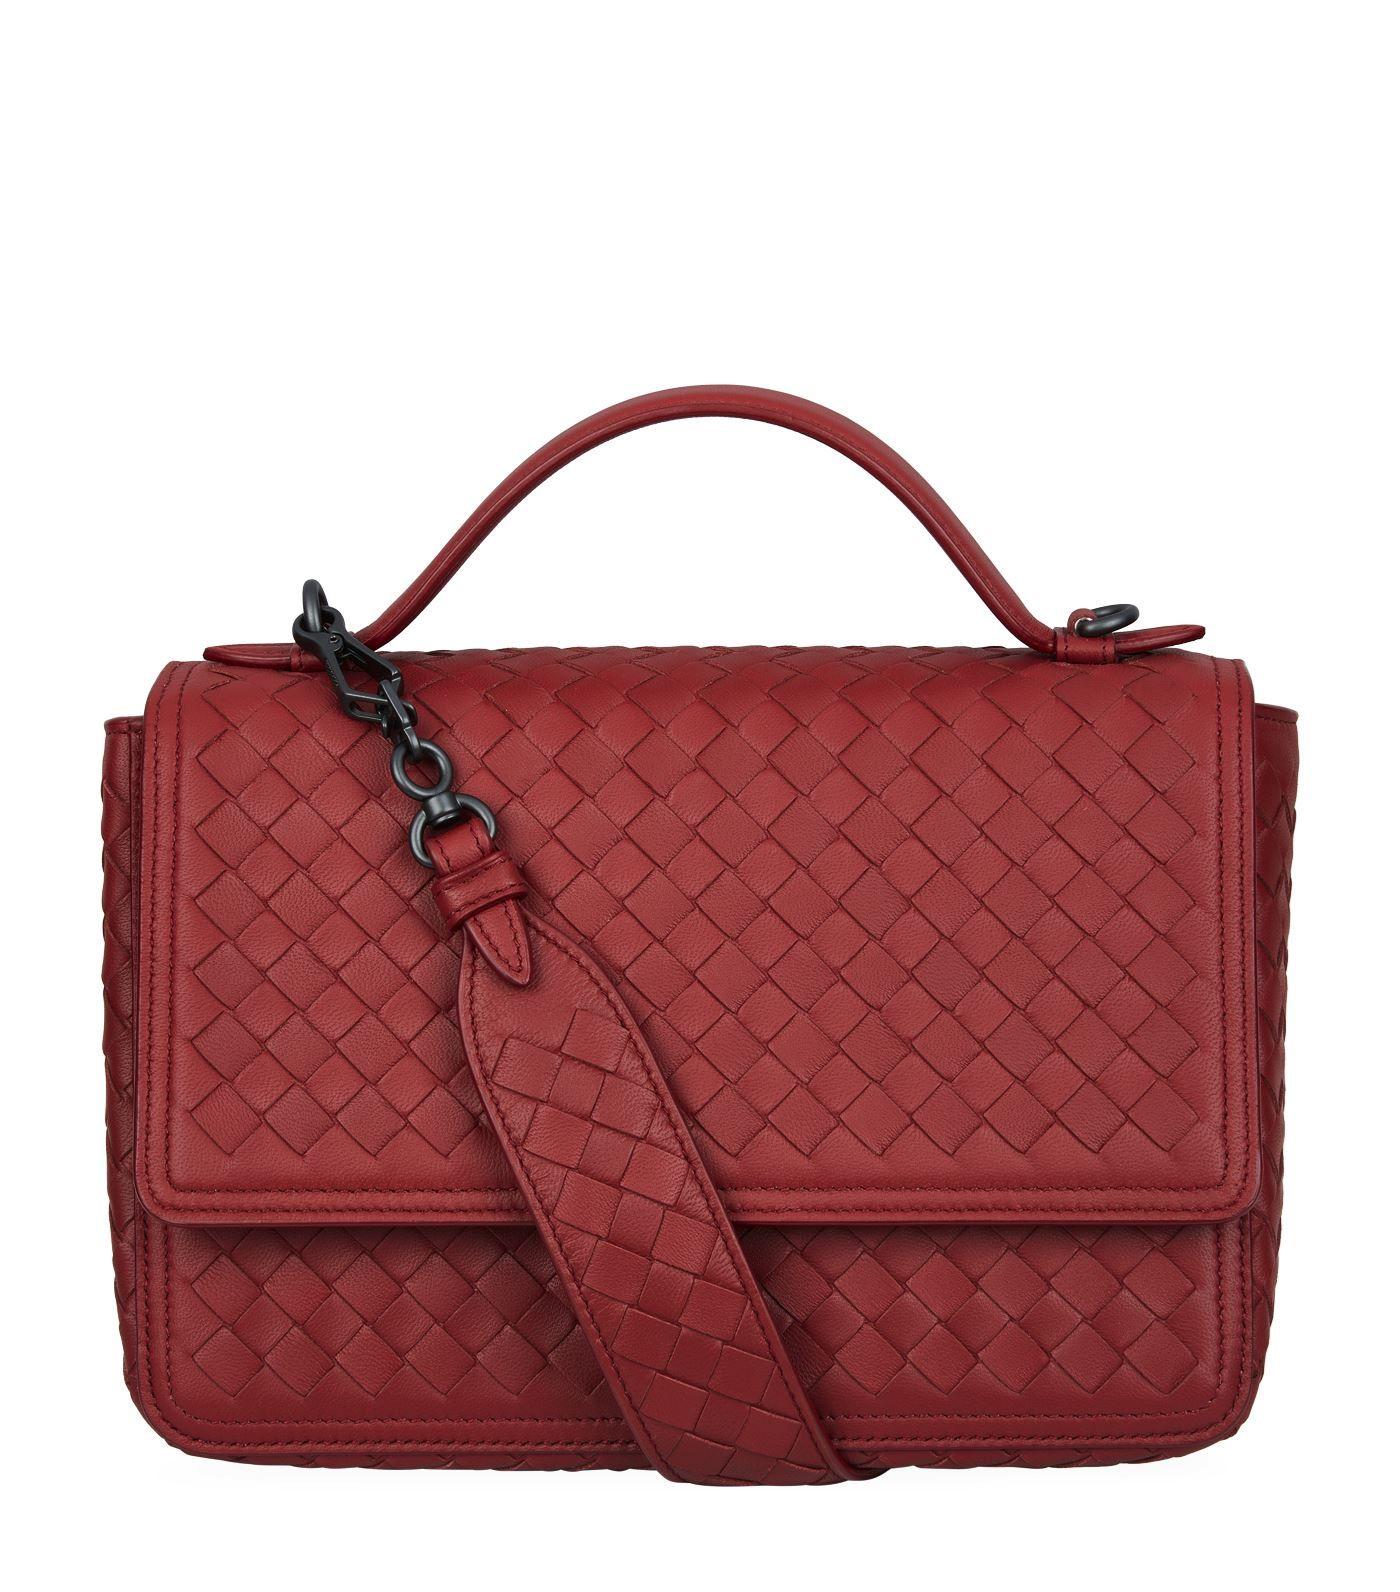 c00b4a5275 BOTTEGA VENETA ALUMNA SHOULDER BAG.  bottegaveneta  bags  shoulder ...